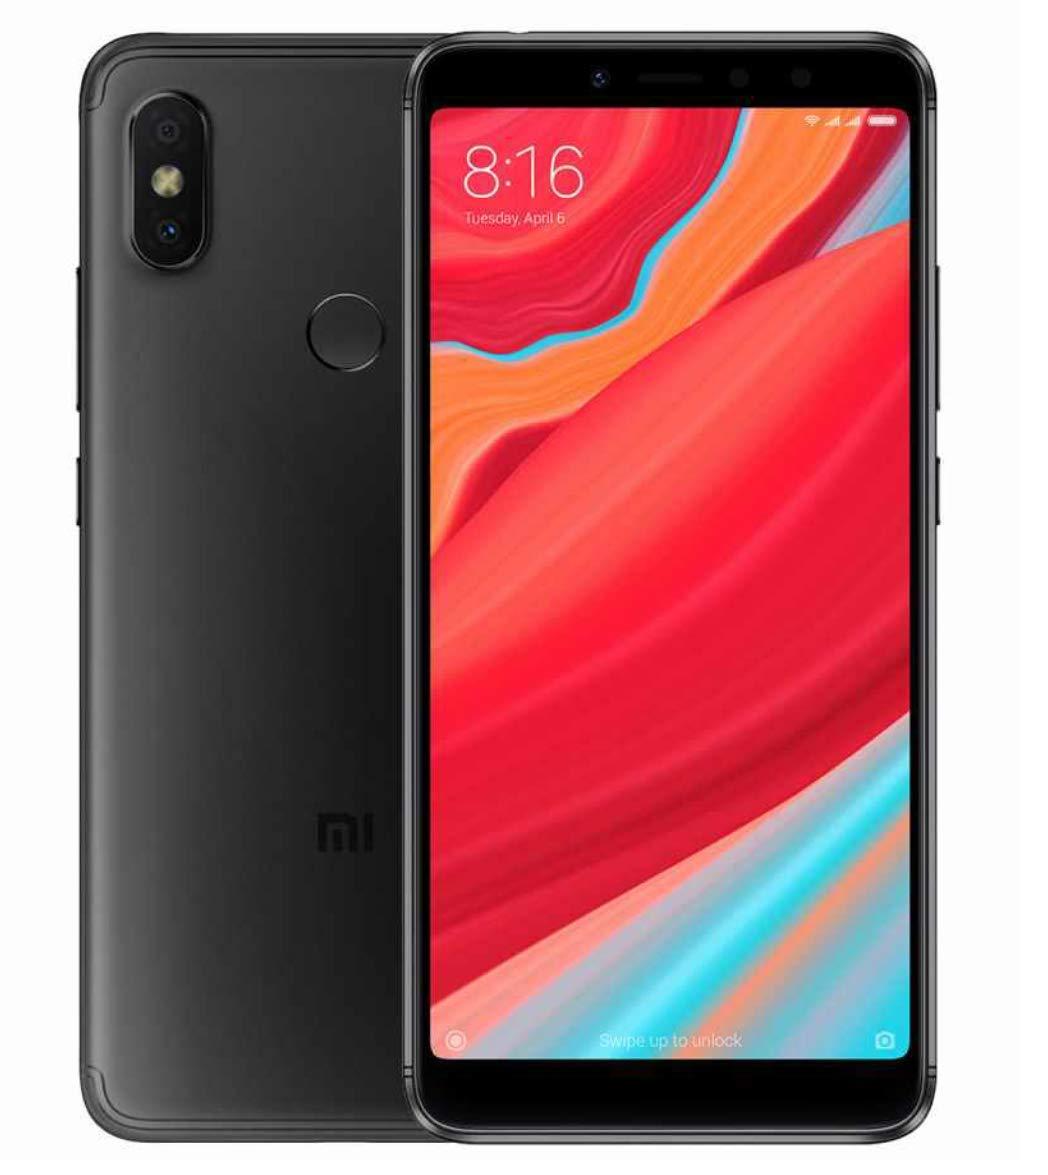 Xiaomi Mi Redmi S2 Dual SIM - 32GB, 3GB RAM, 4G LTE, Black Global Versia